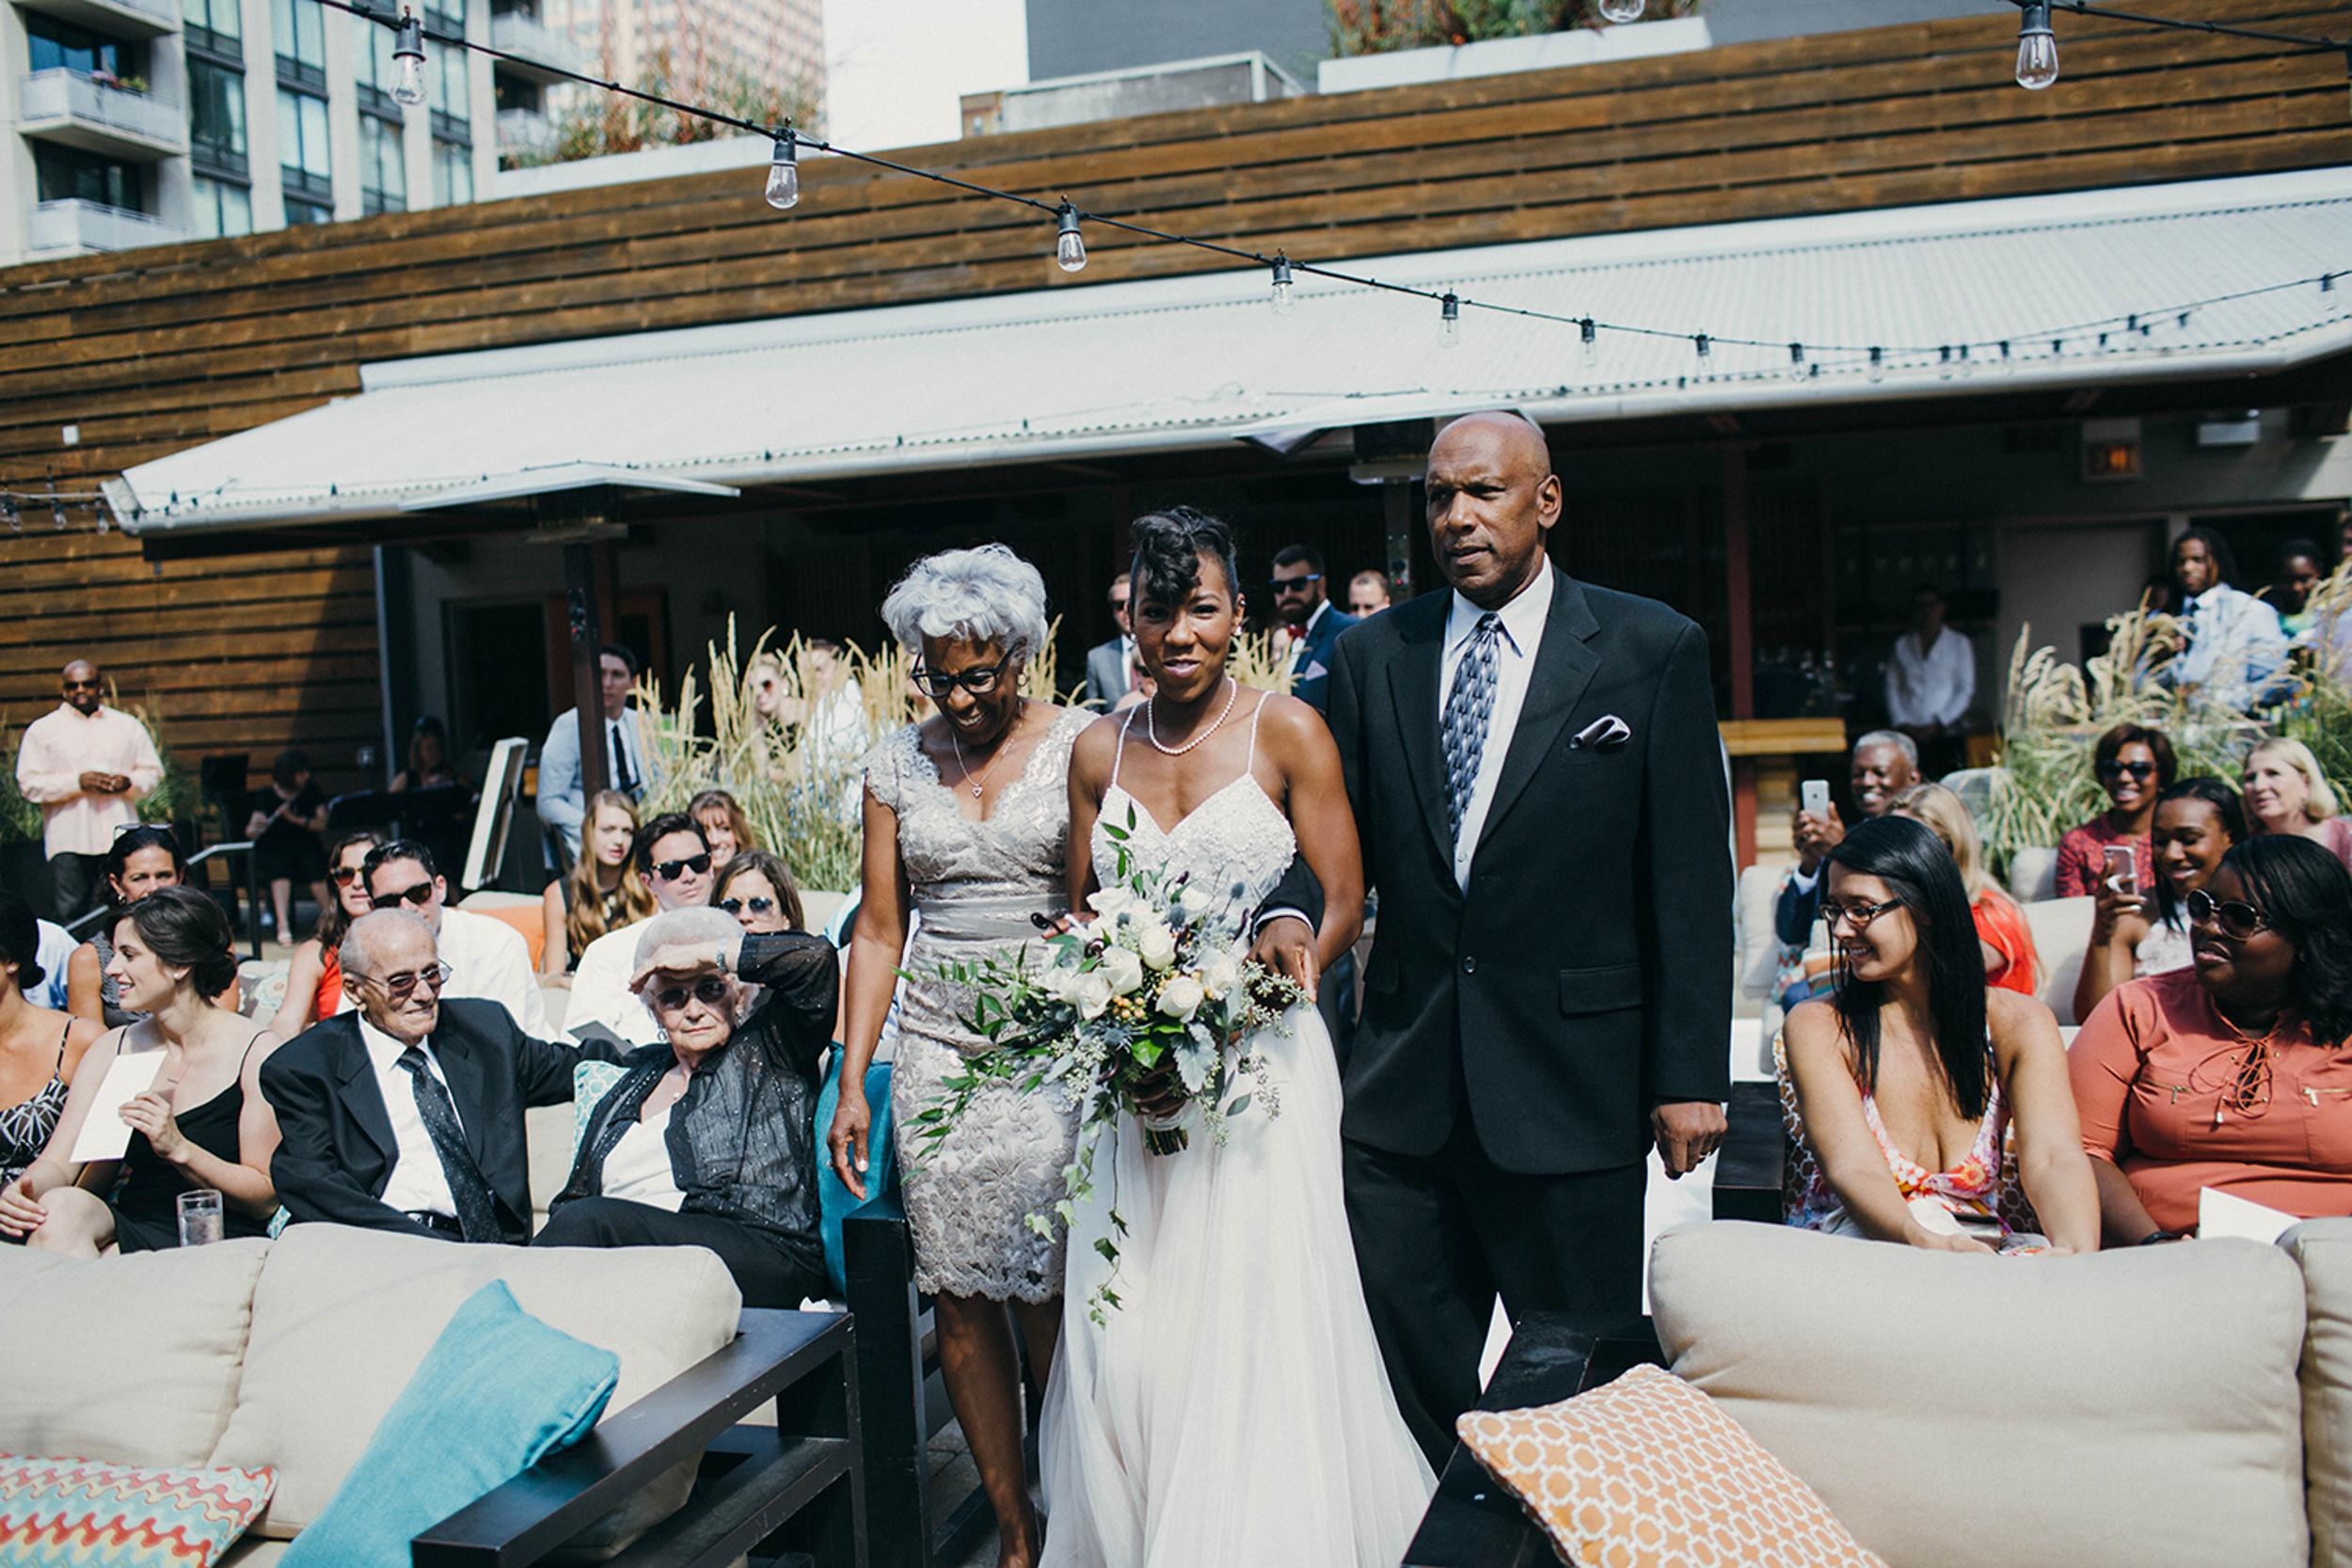 chicago.wedding.urban.intimate.zed451.lake.milton olive park-45.jpg